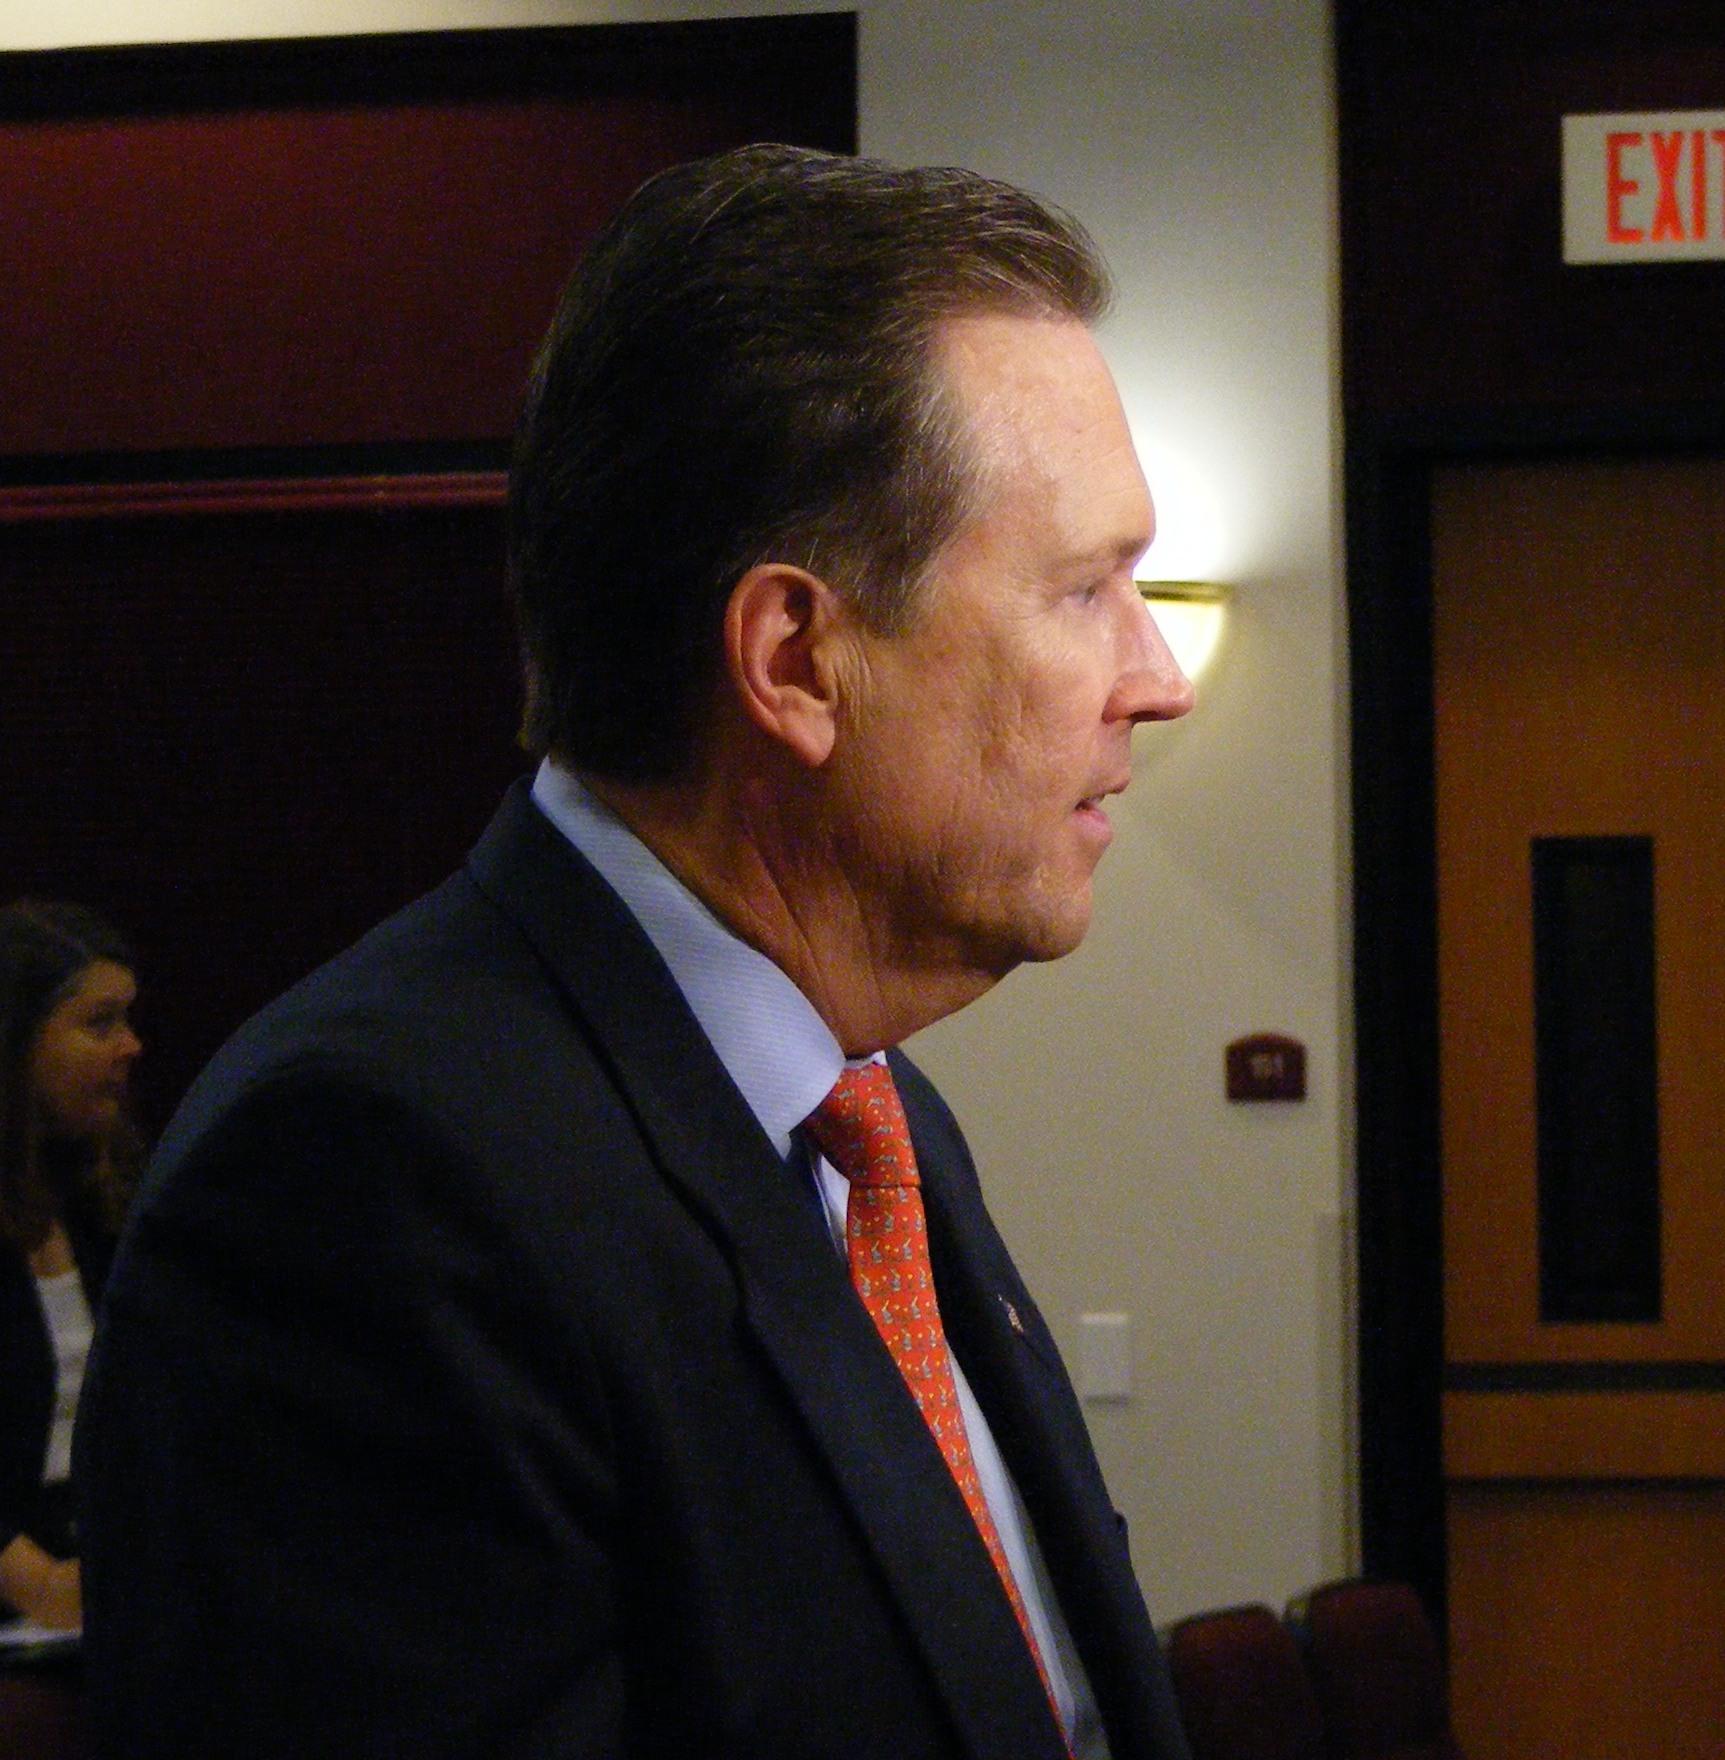 U.S. Rep. Vern Buchanan from Sarasota